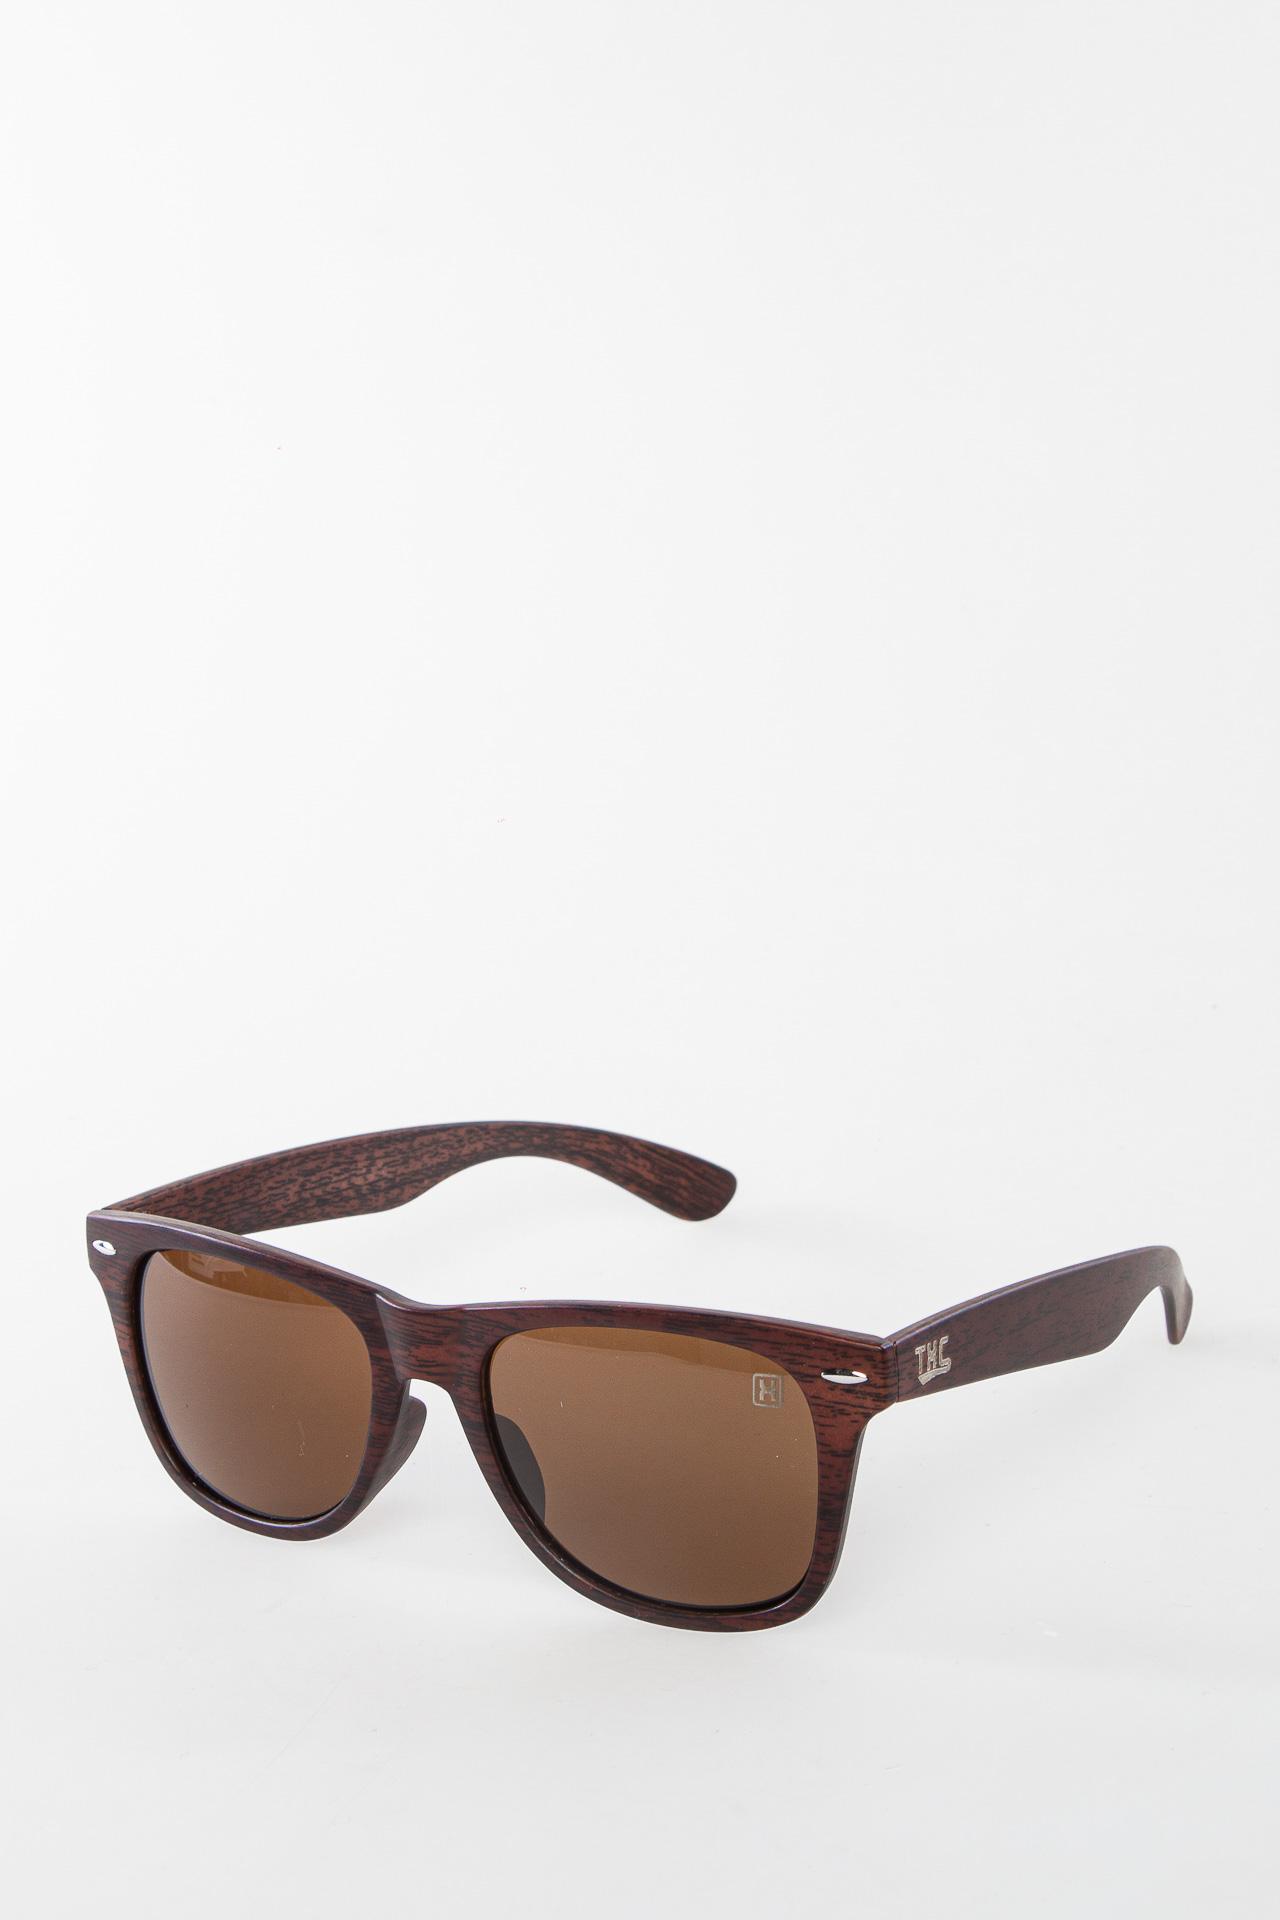 Óculos de Sol TXC 79.1 OC